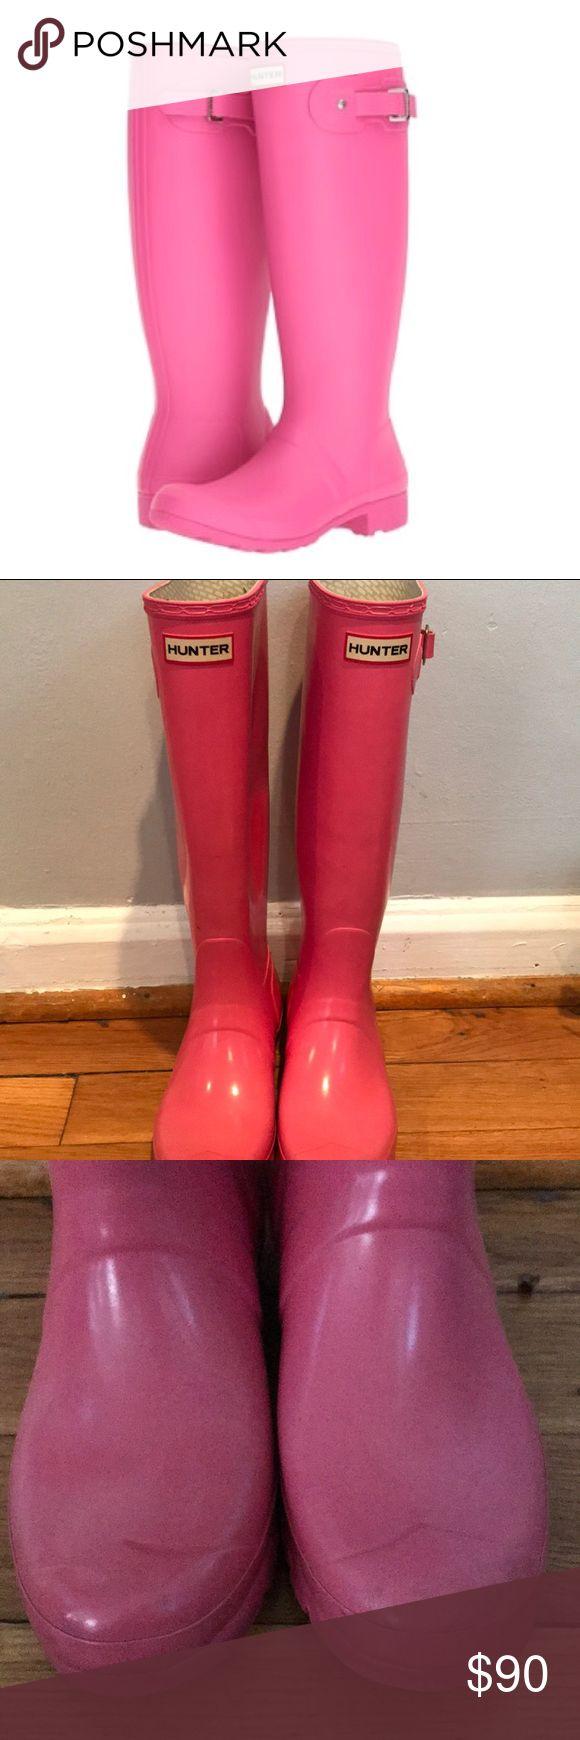 best 25 pink hunter rain boots ideas on pinterest pink